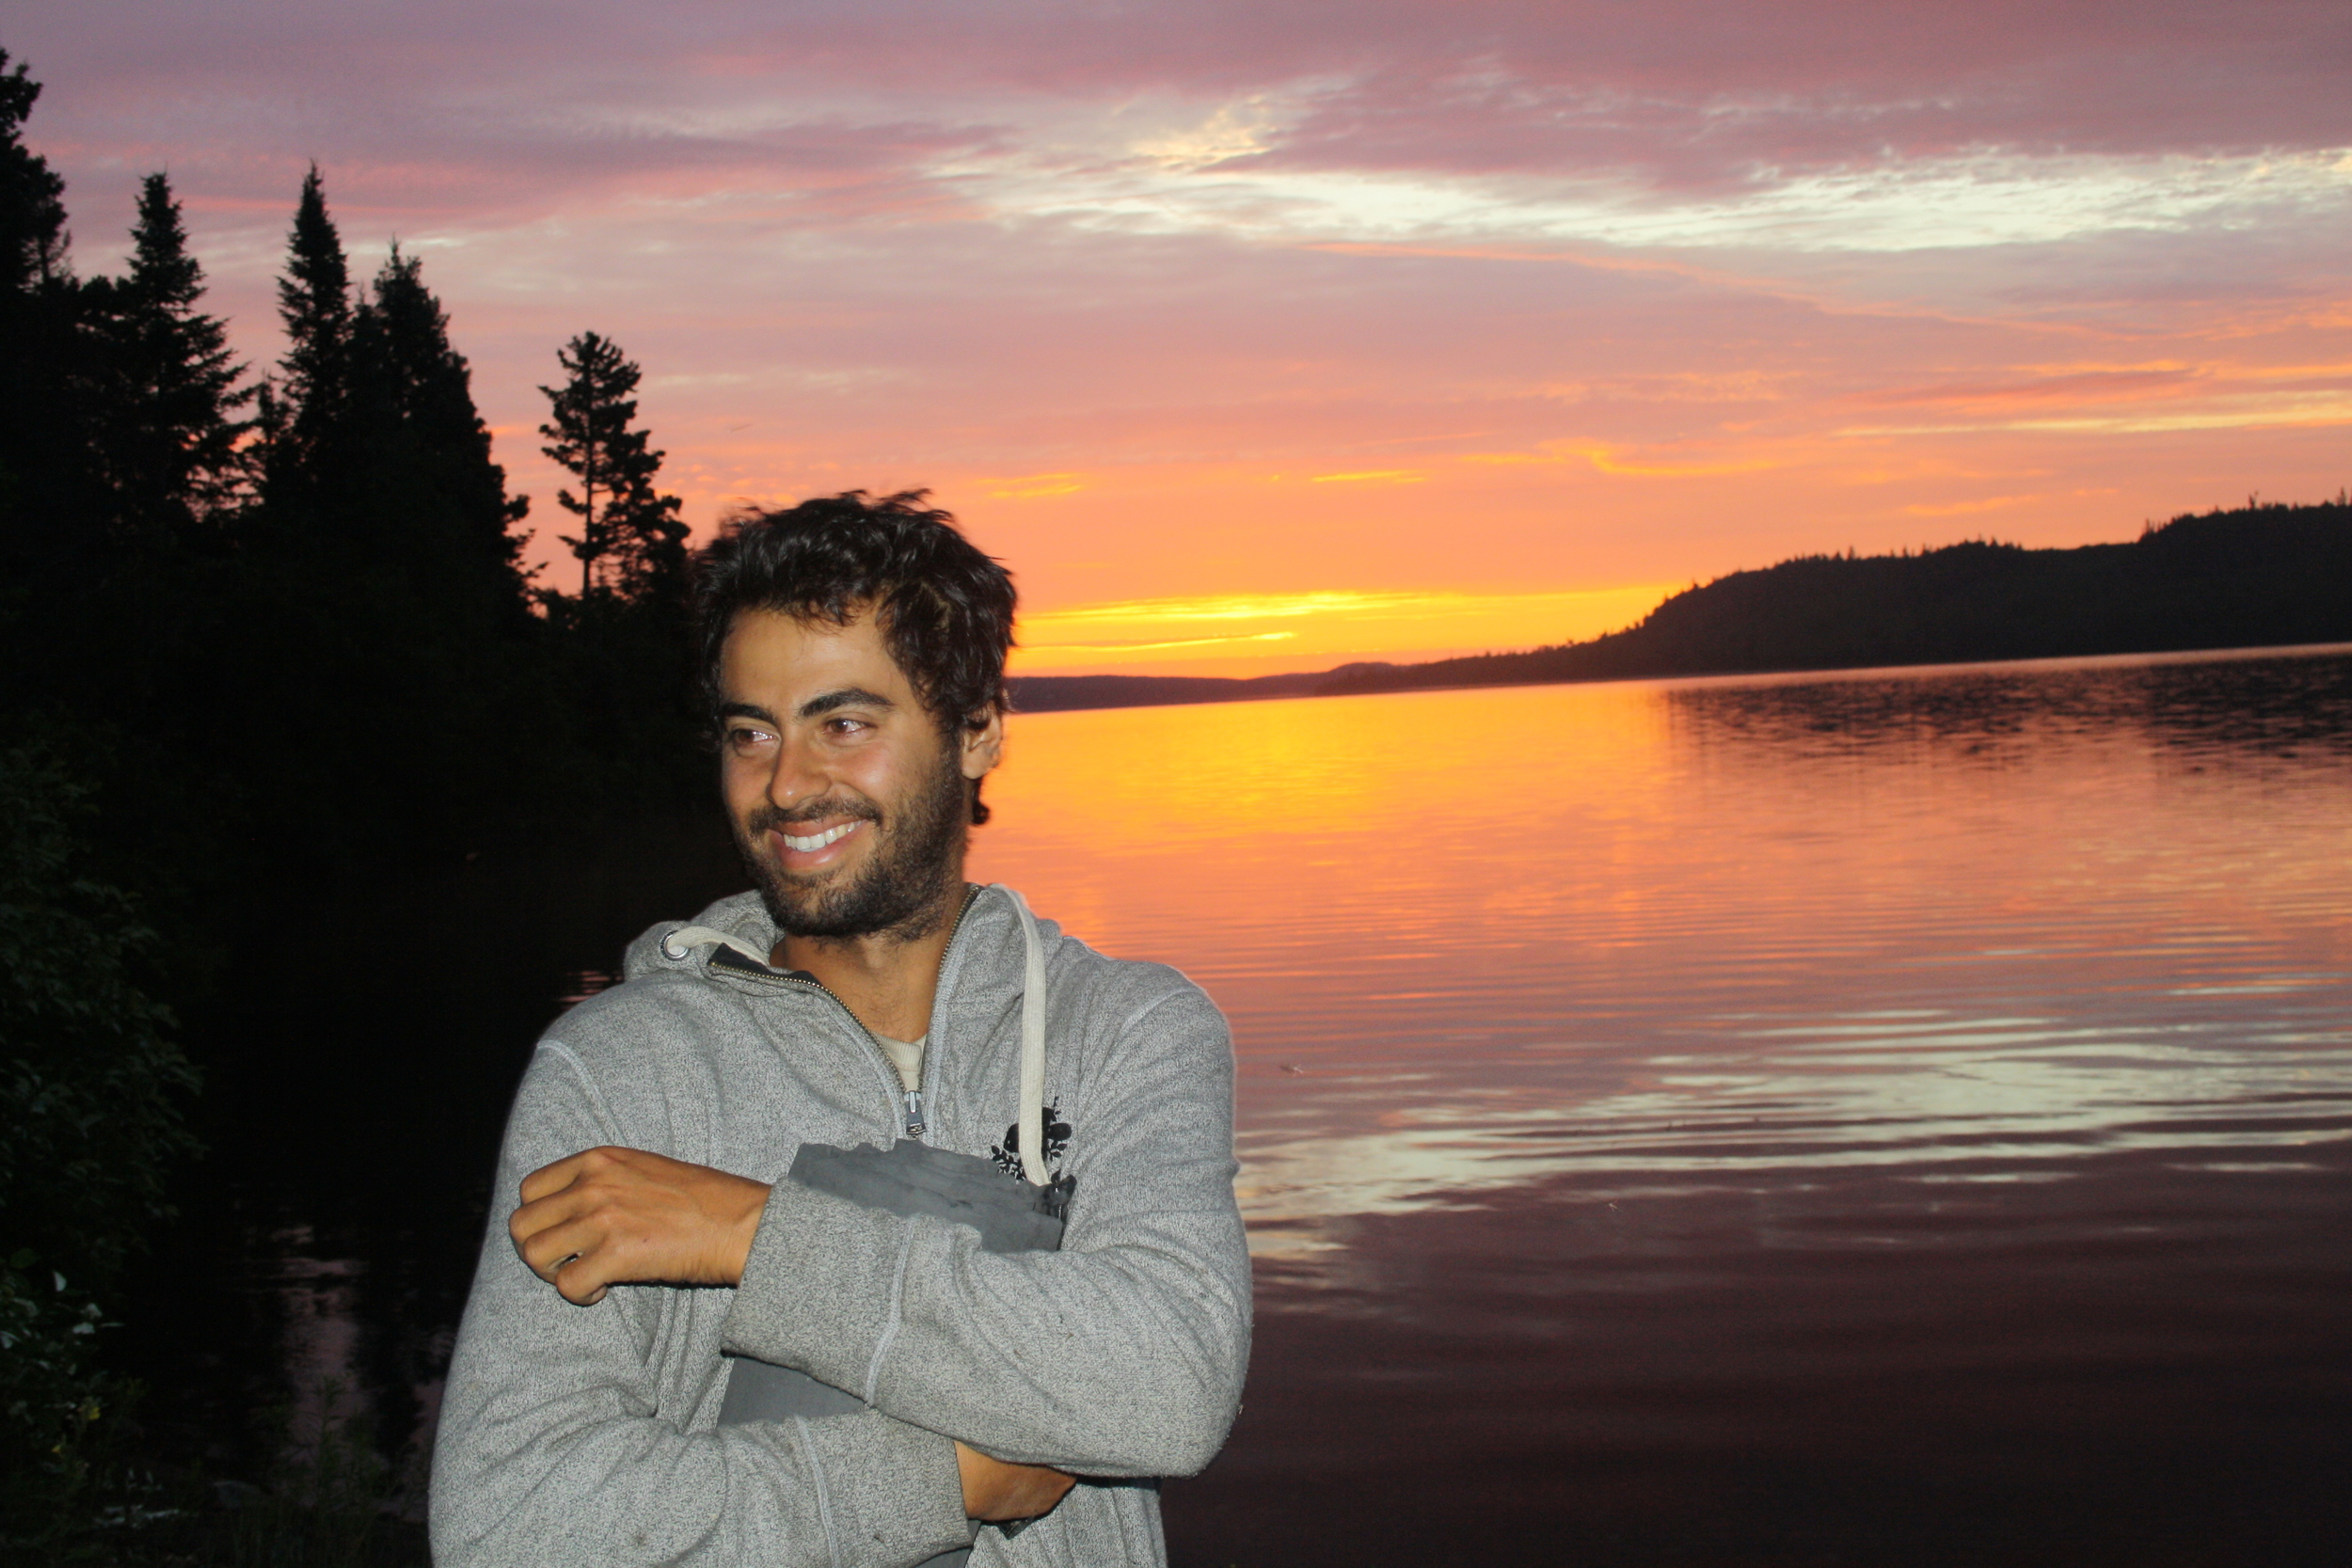 Marc at twilight